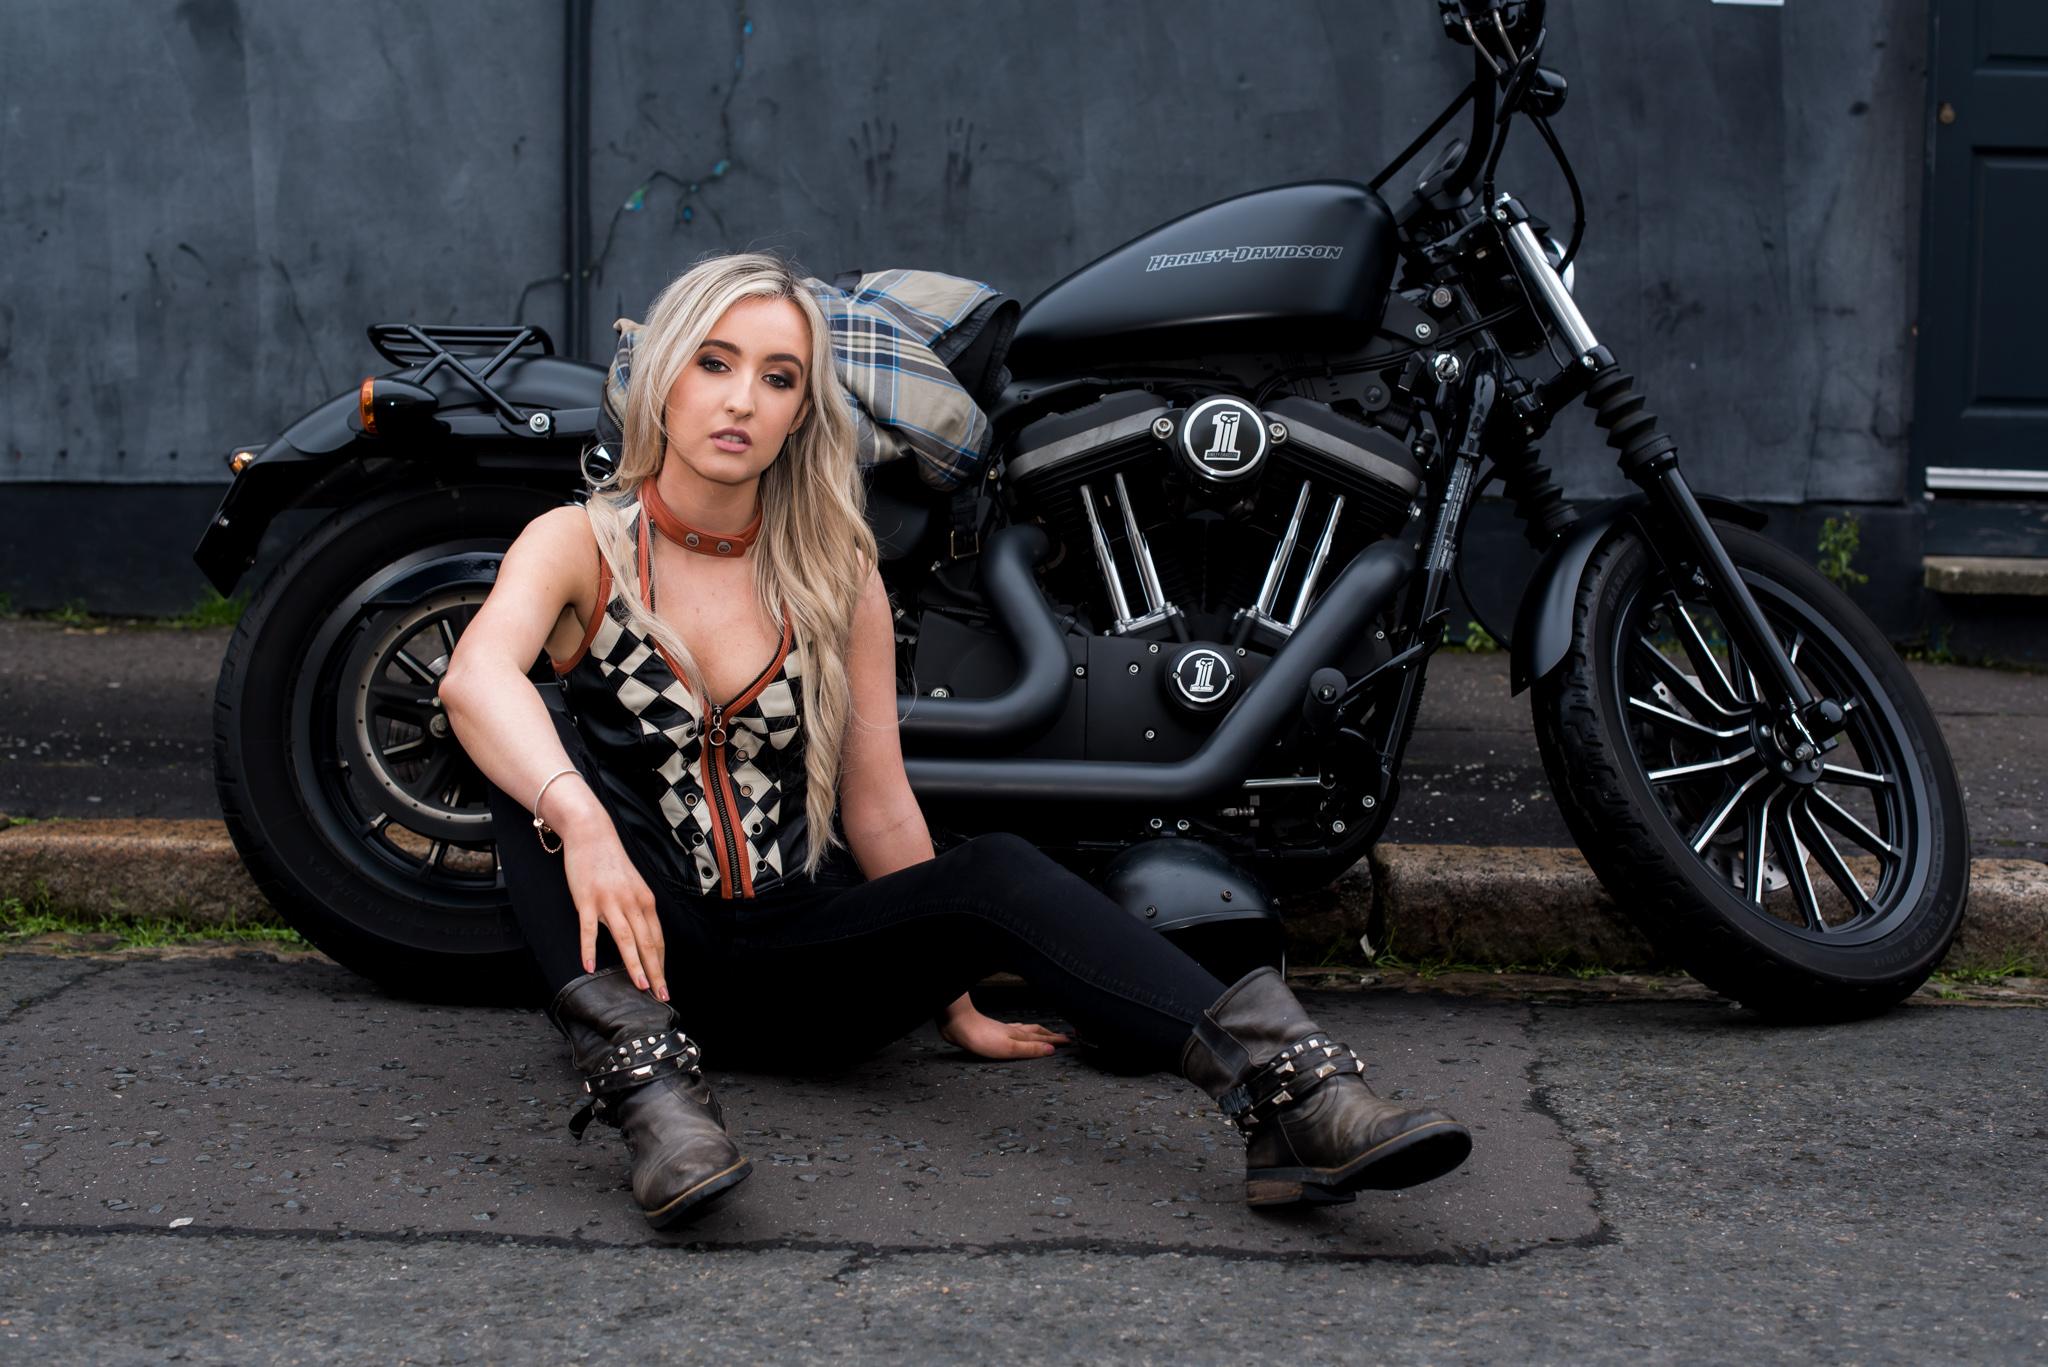 Harley Girl